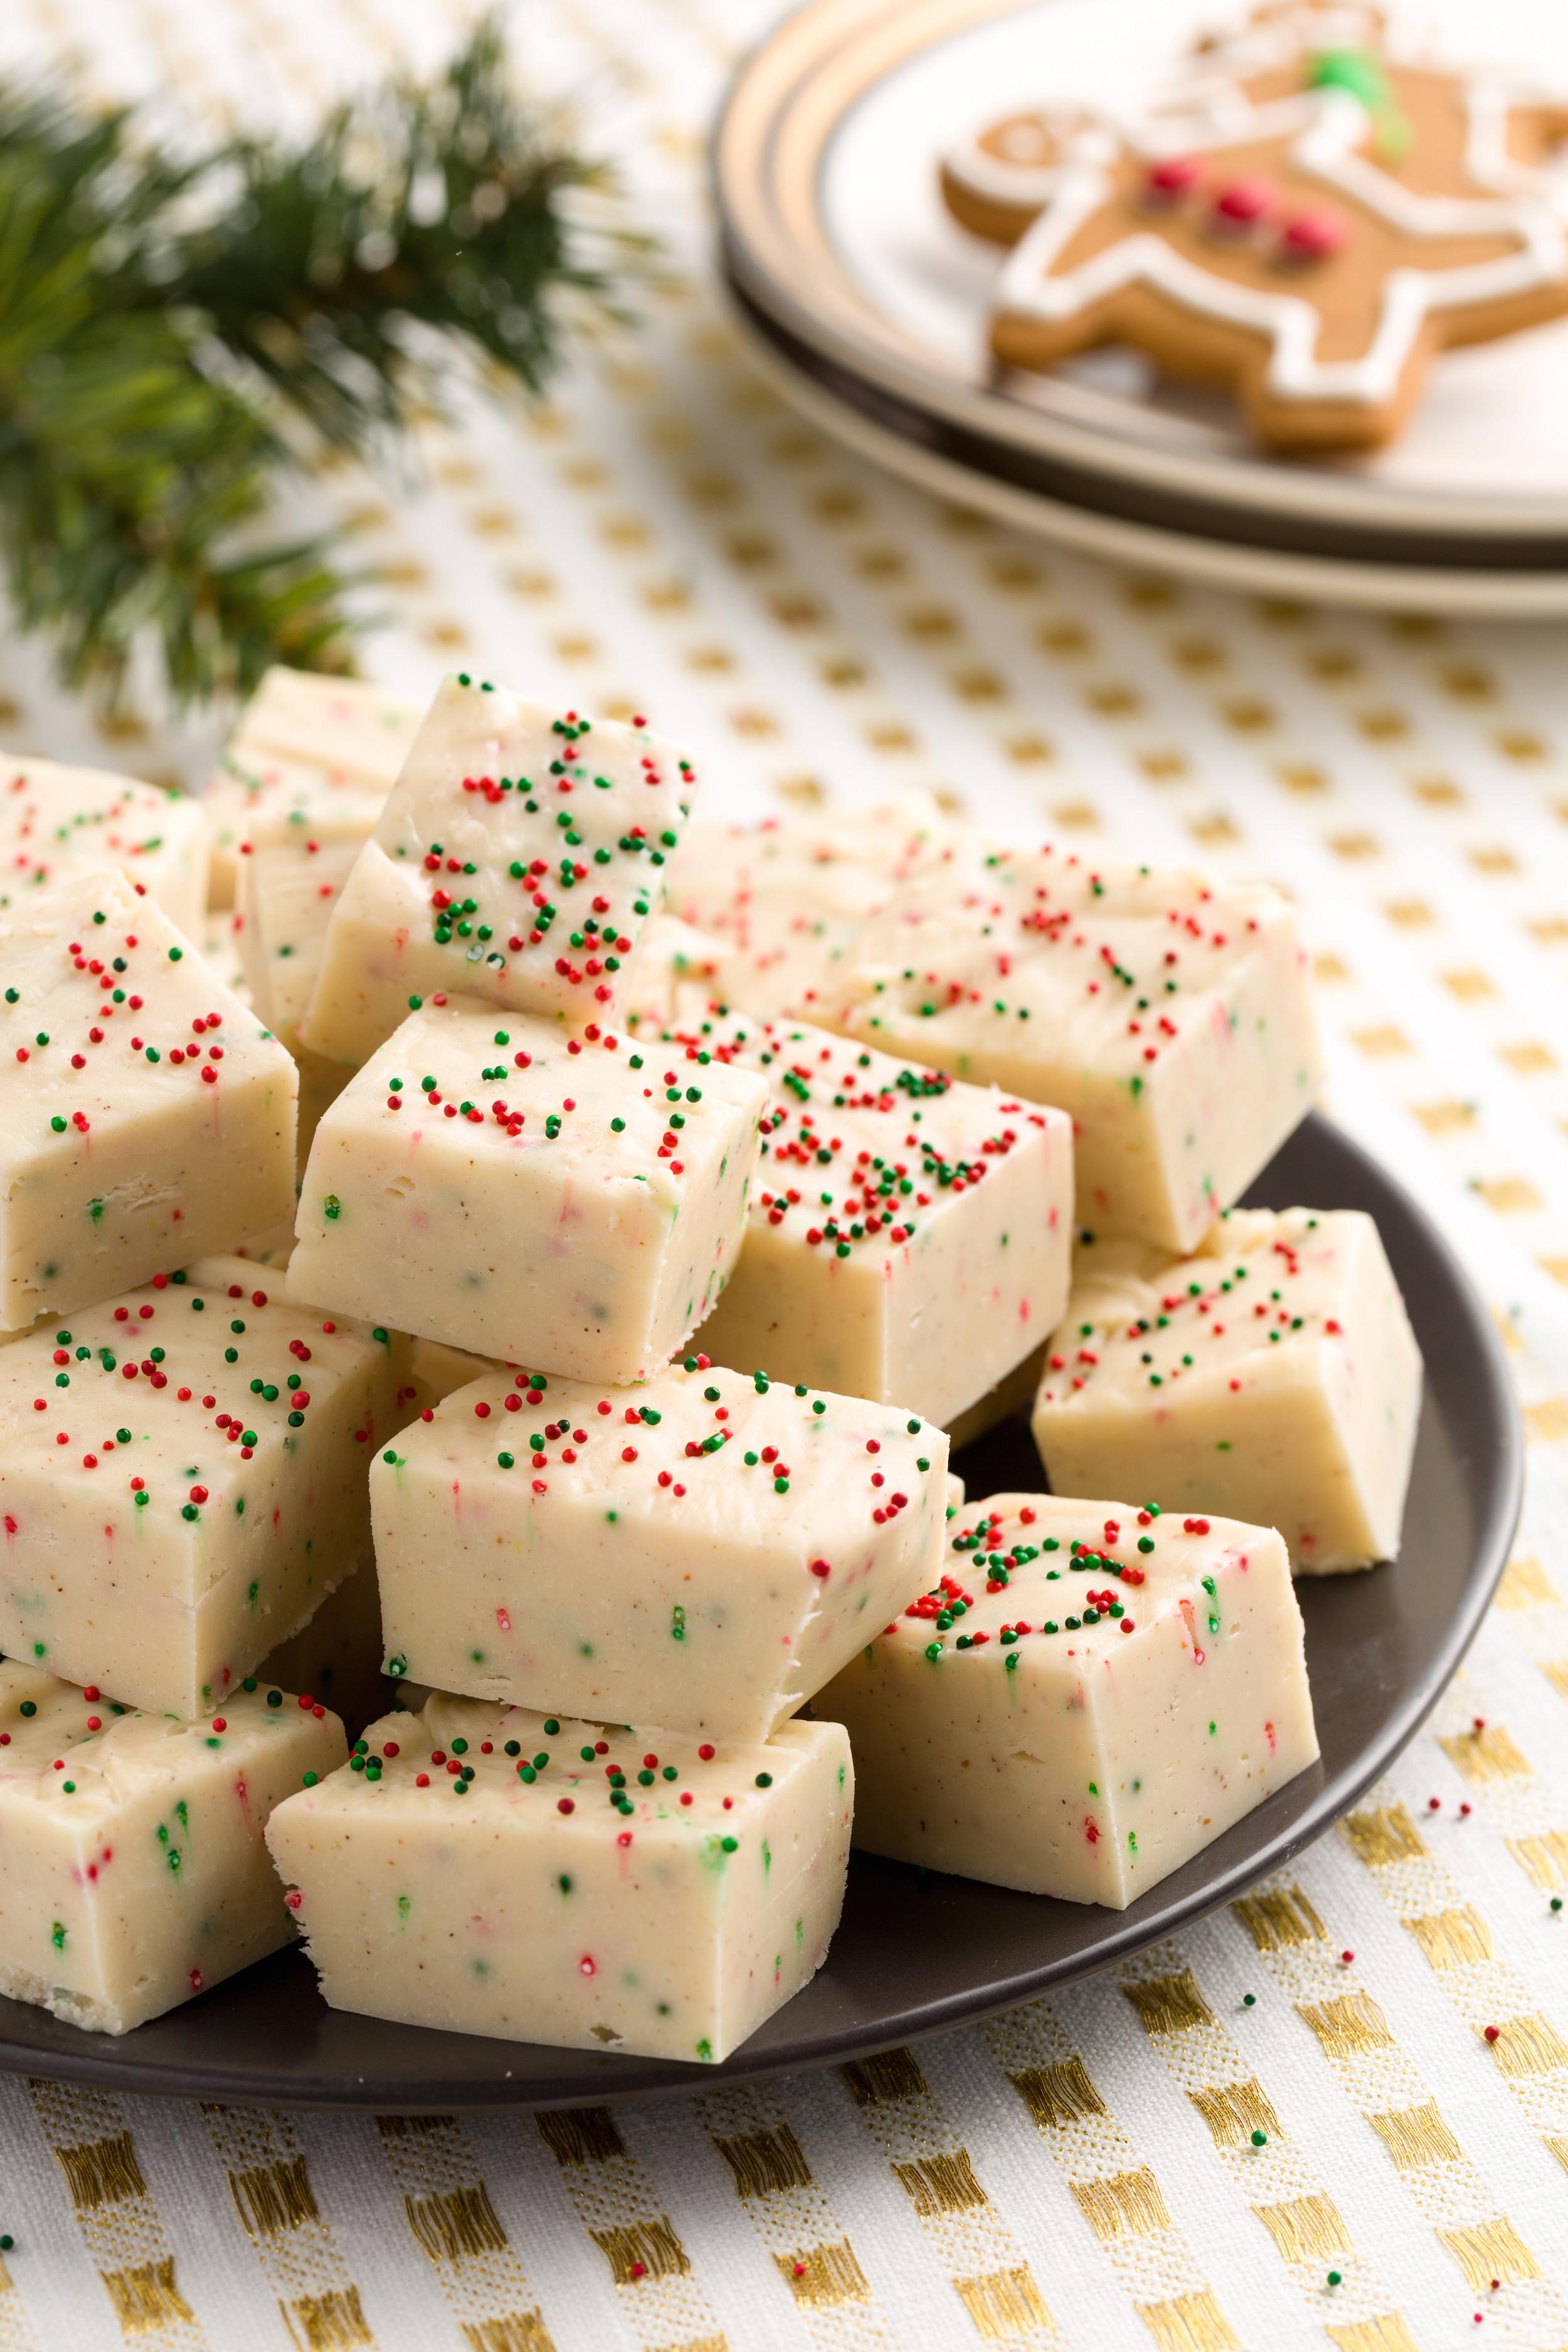 Easy Christmas Candy  18 Easy Homemade Christmas Candy Recipes How To Make